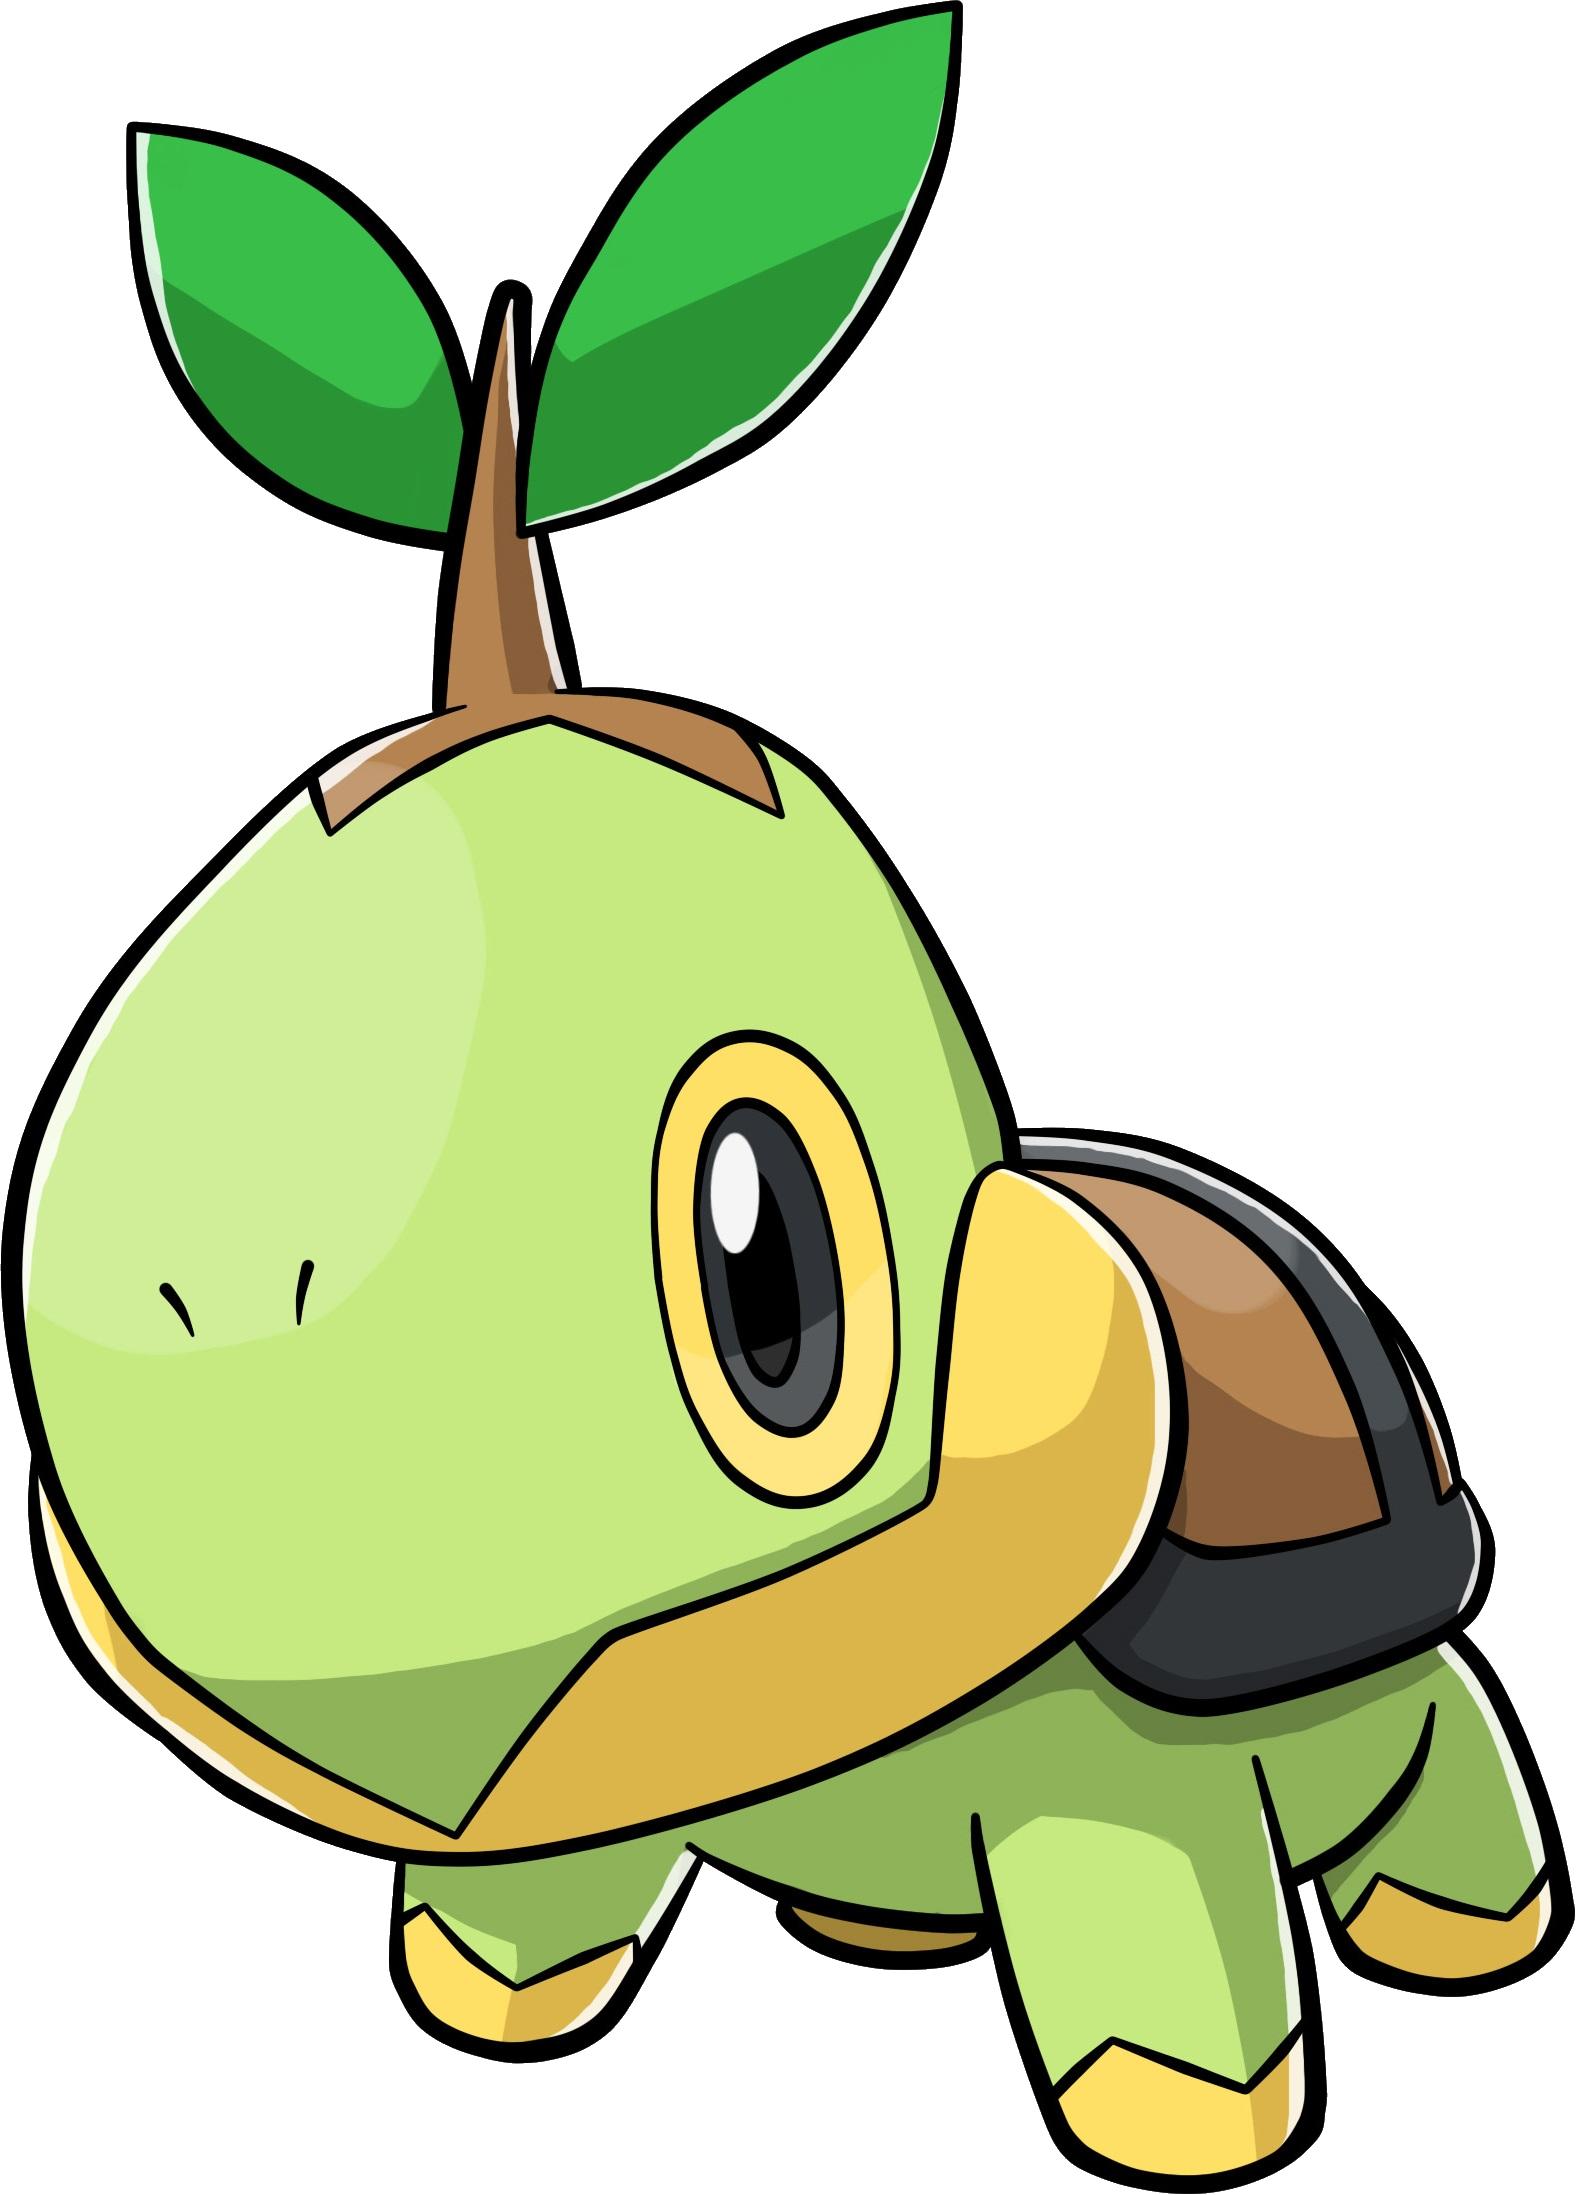 Image turtwig ranger guardian. Pokemon clipart turtle